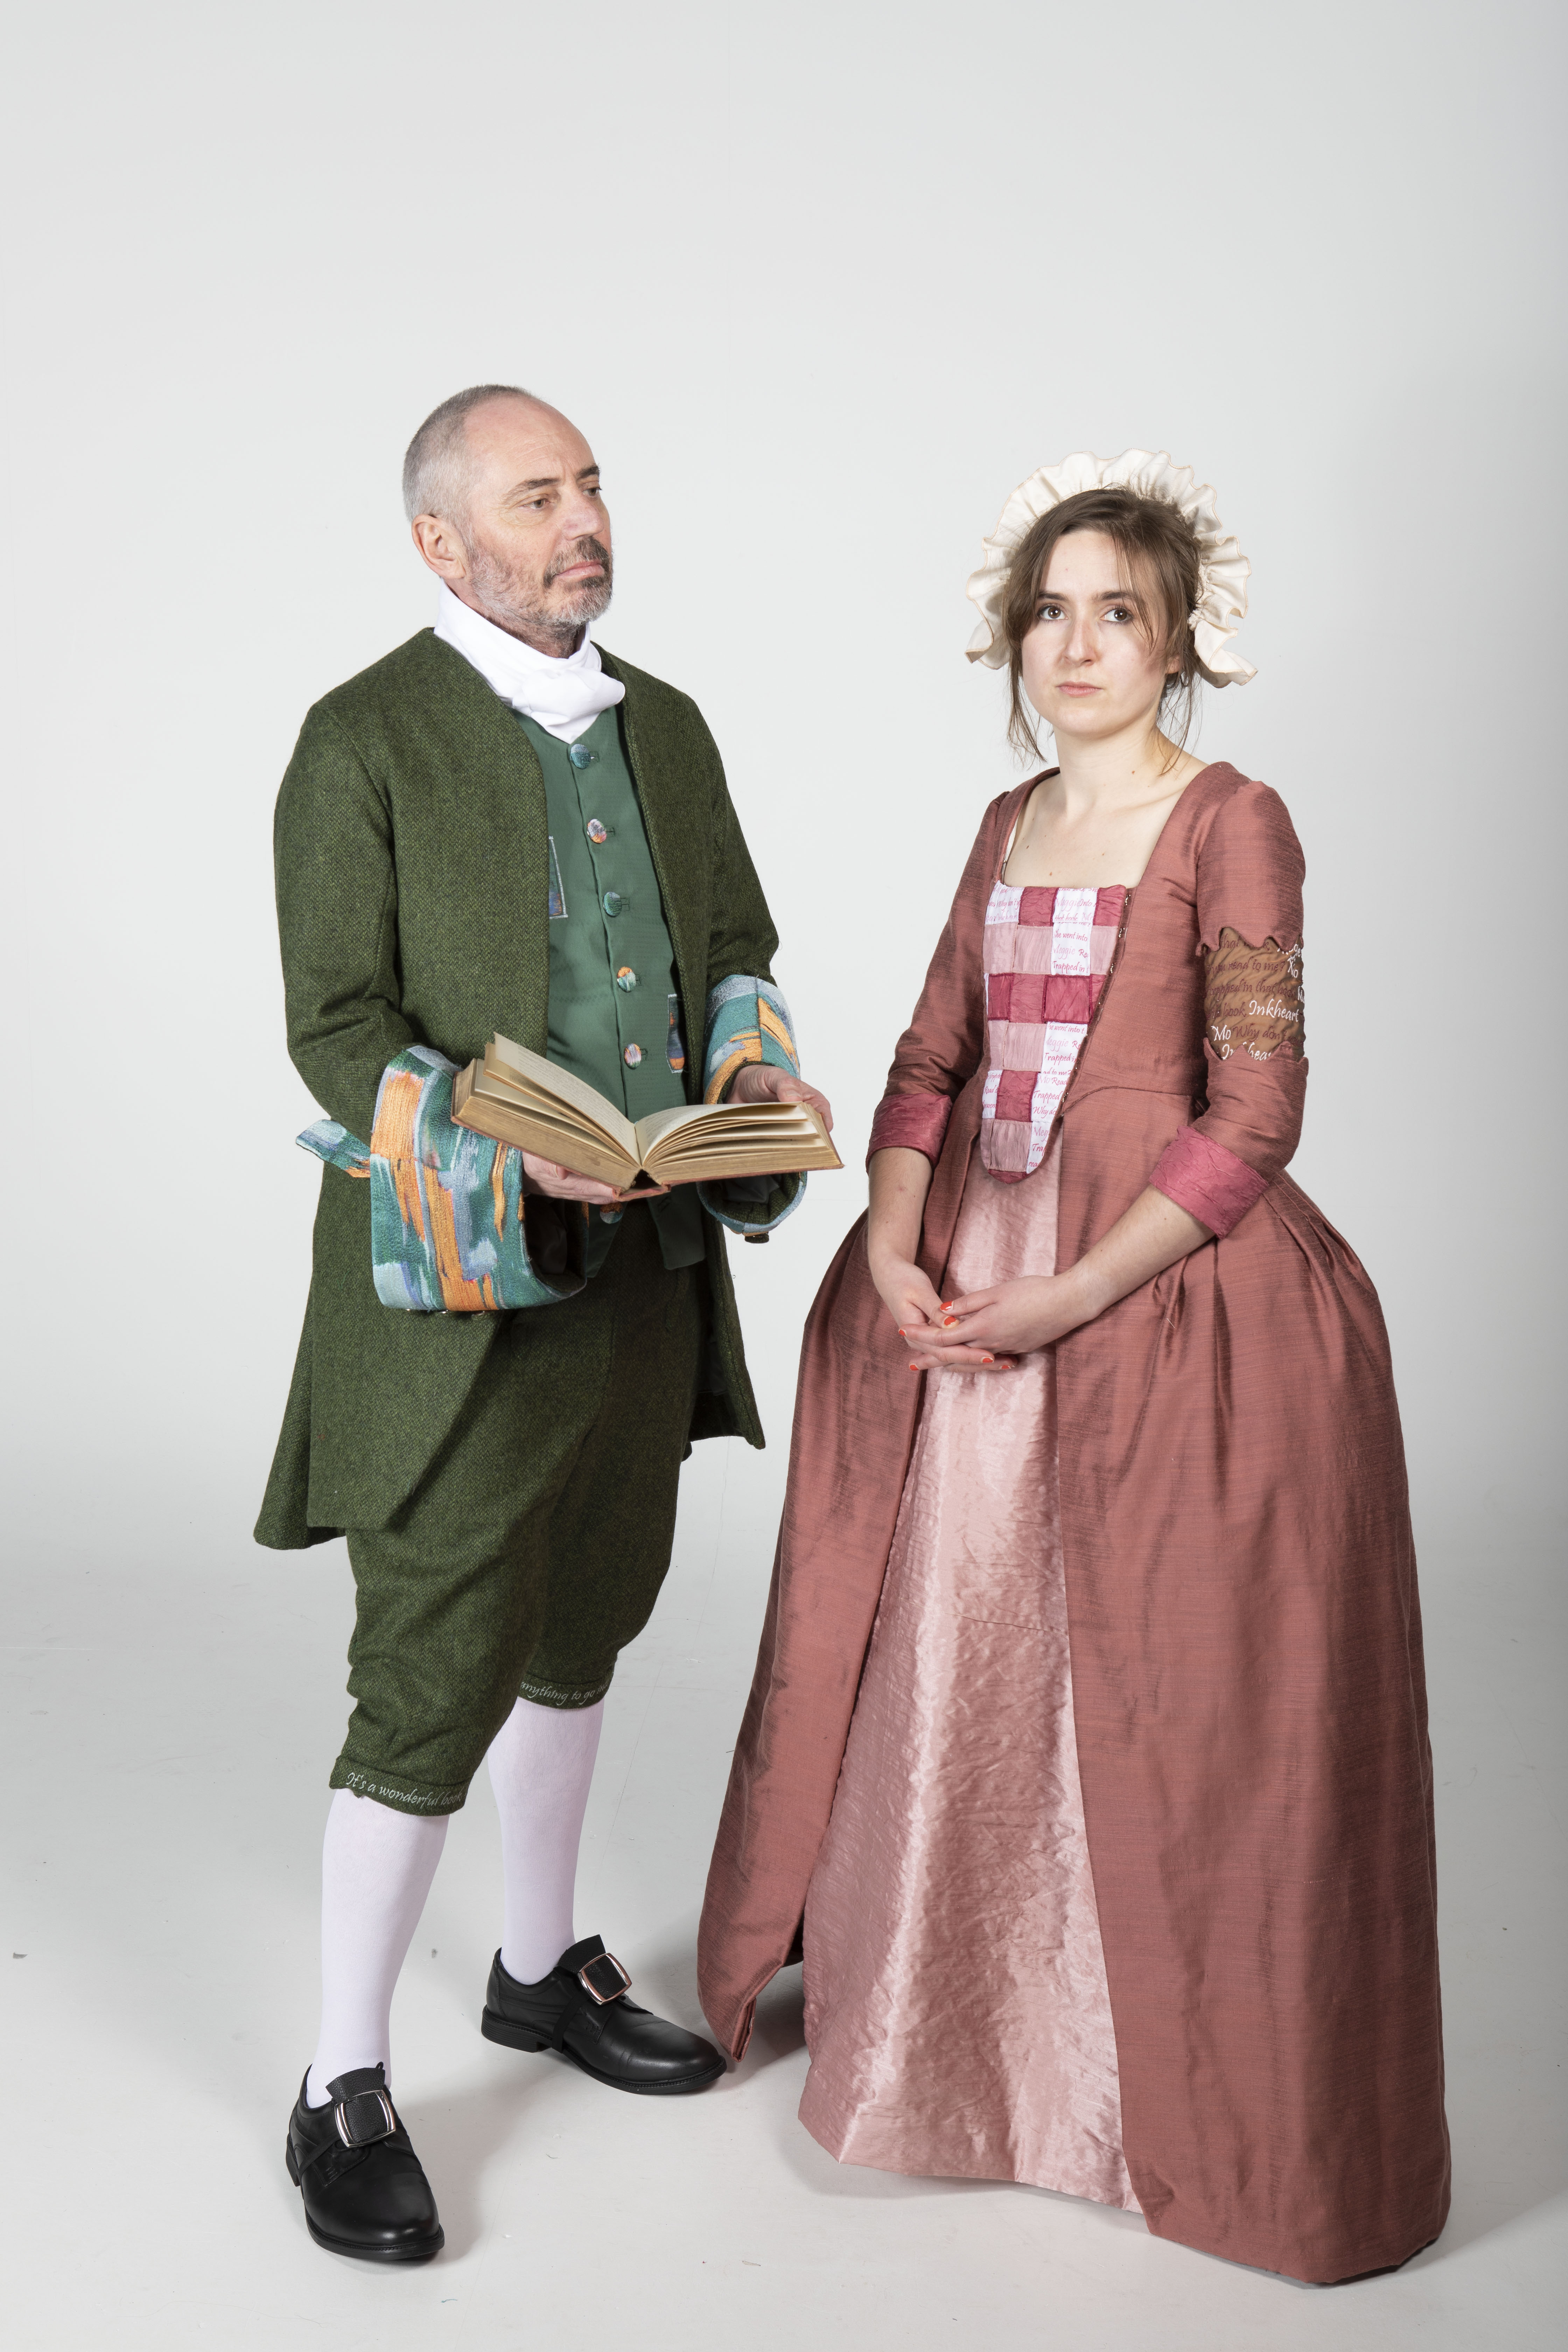 Costumes 20193197